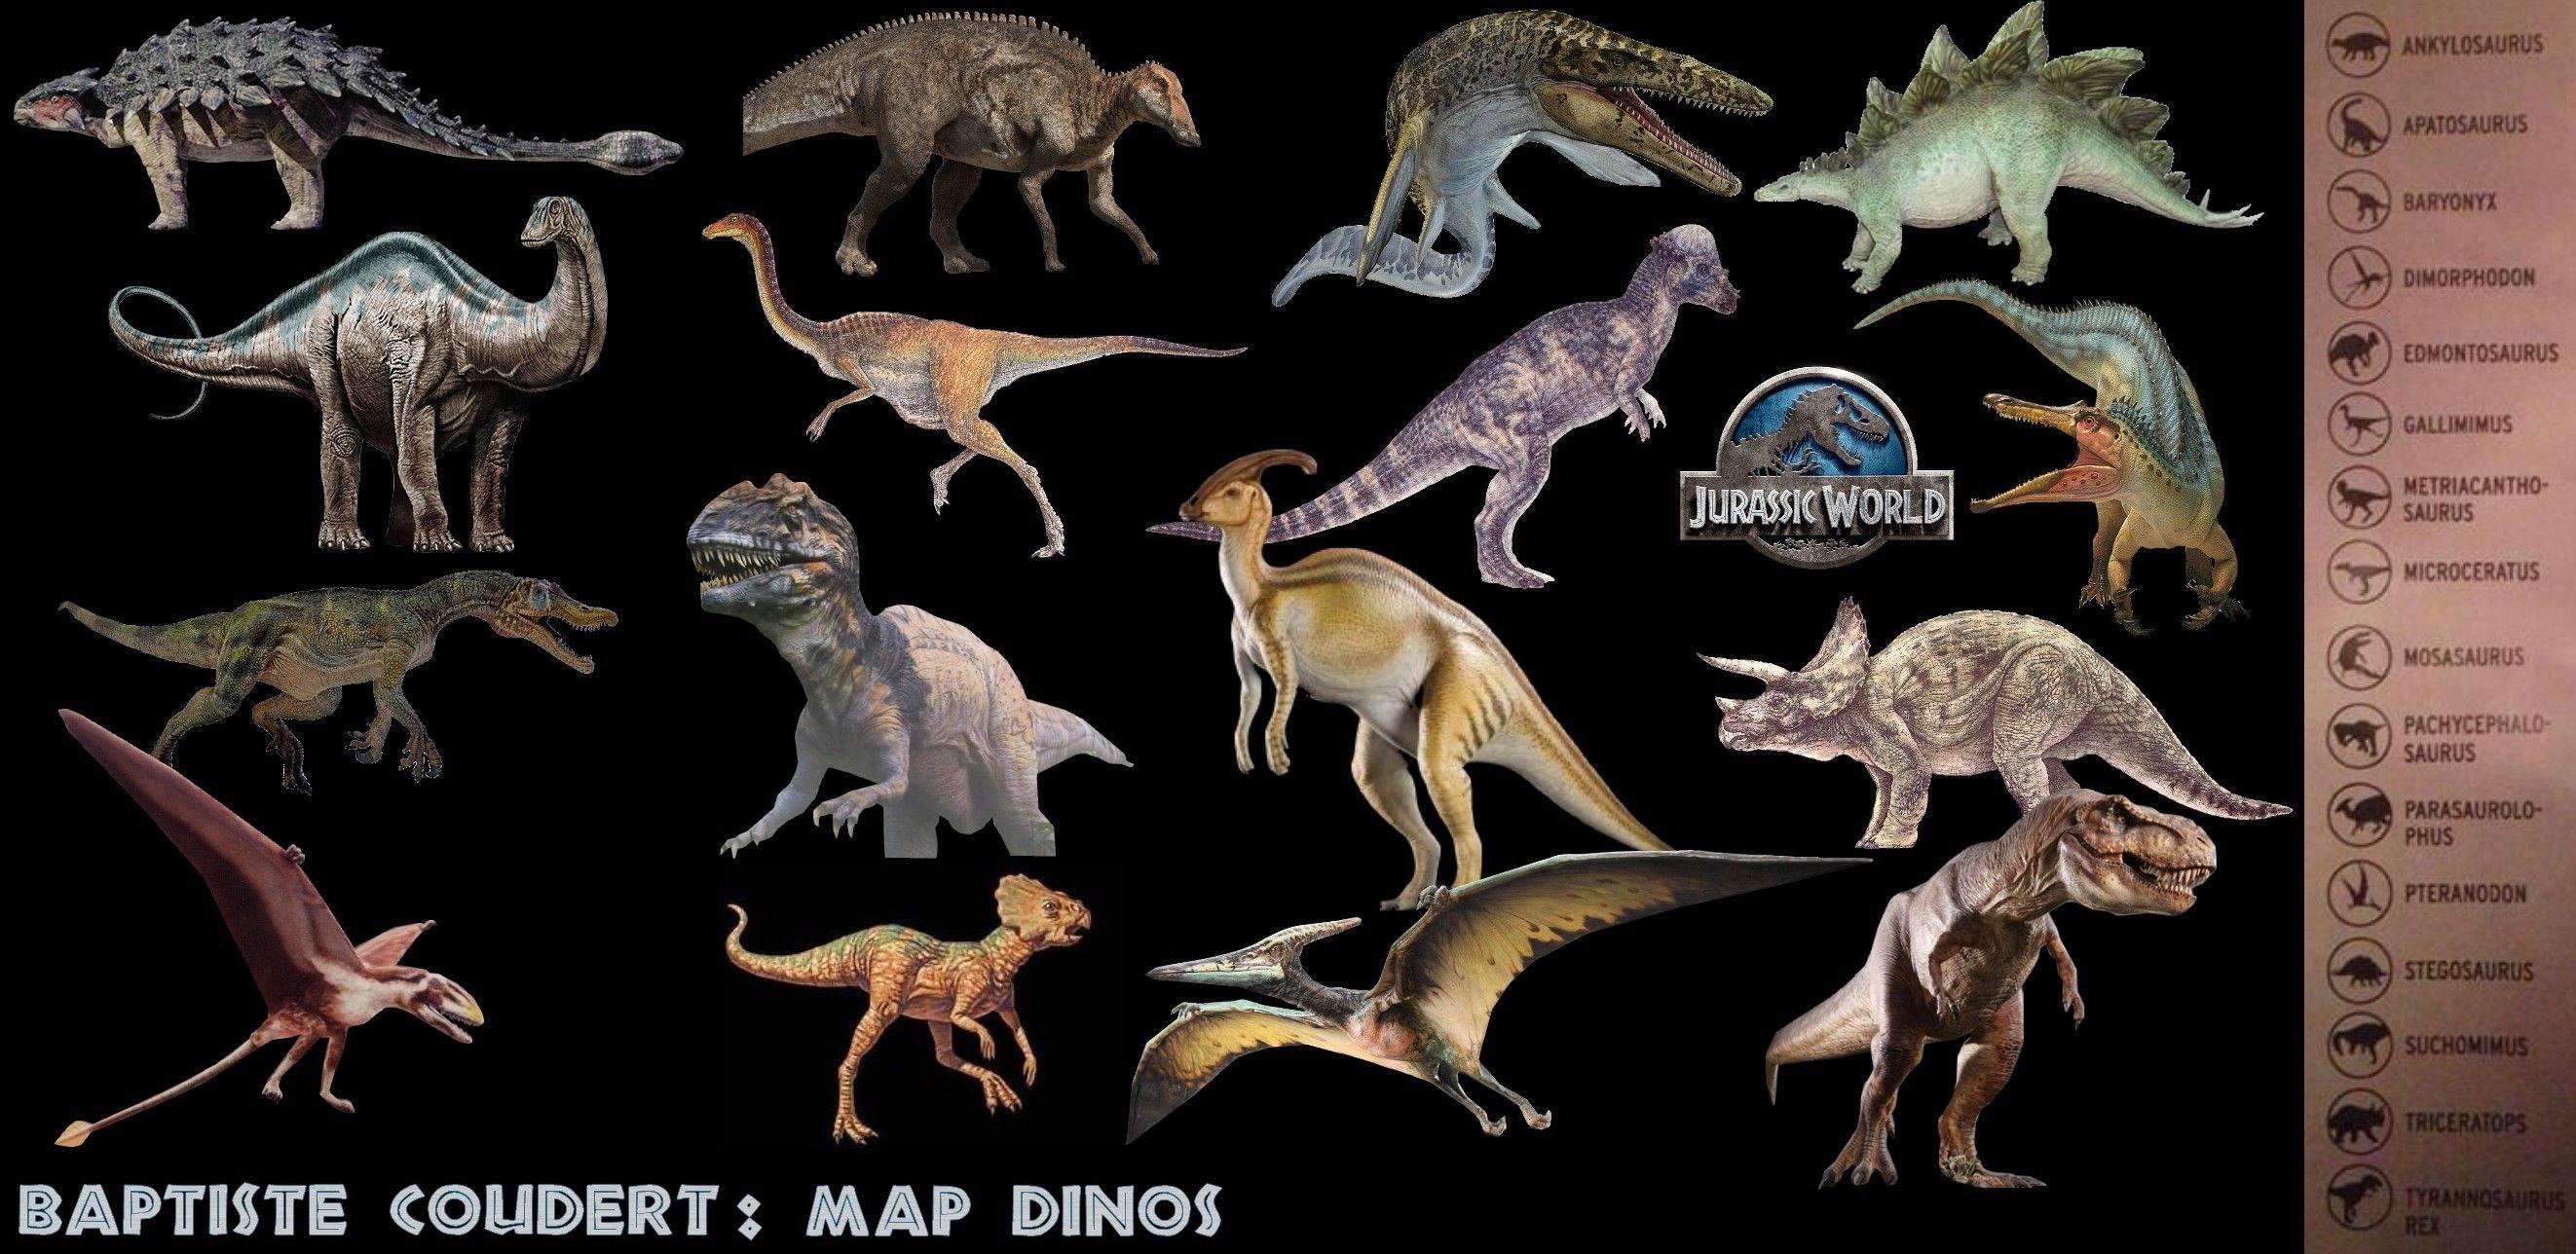 Jurassic World 2015 (Jurassic Park 4) Dinosaurs List ...